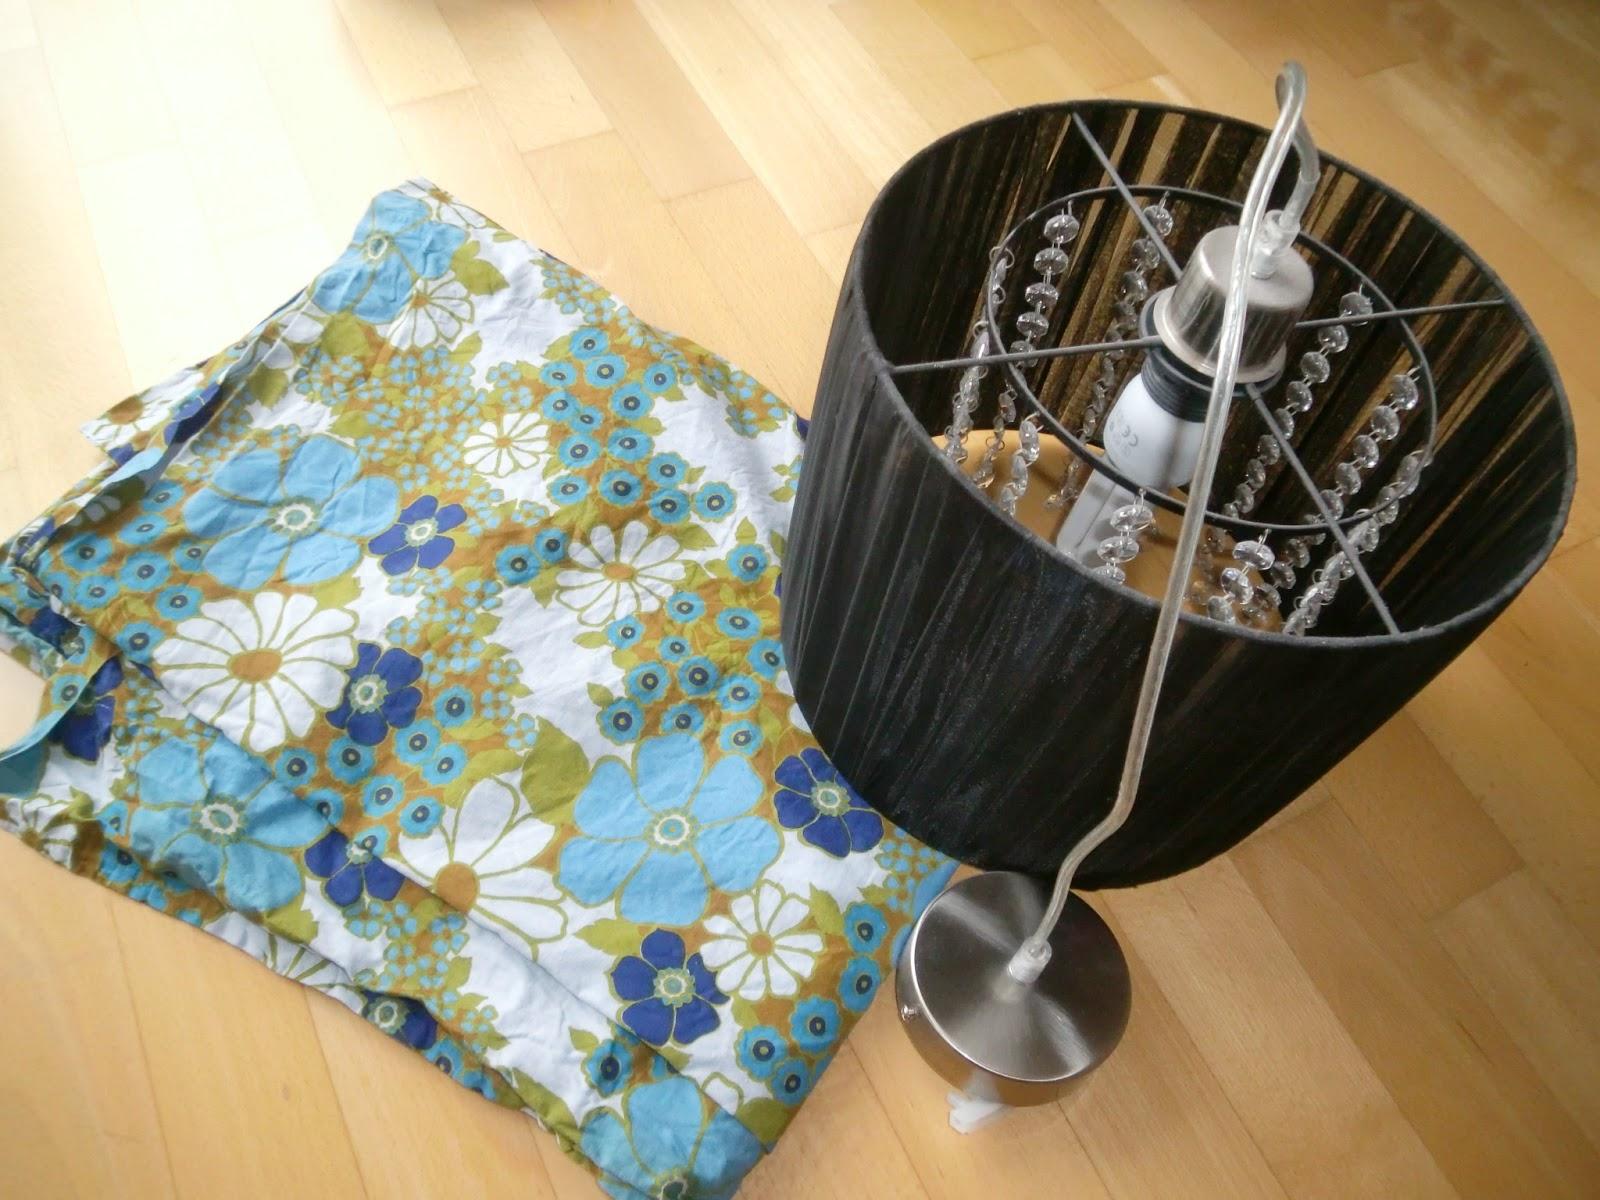 lampenschirm selbst beziehen lampenschirm mit stoff. Black Bedroom Furniture Sets. Home Design Ideas